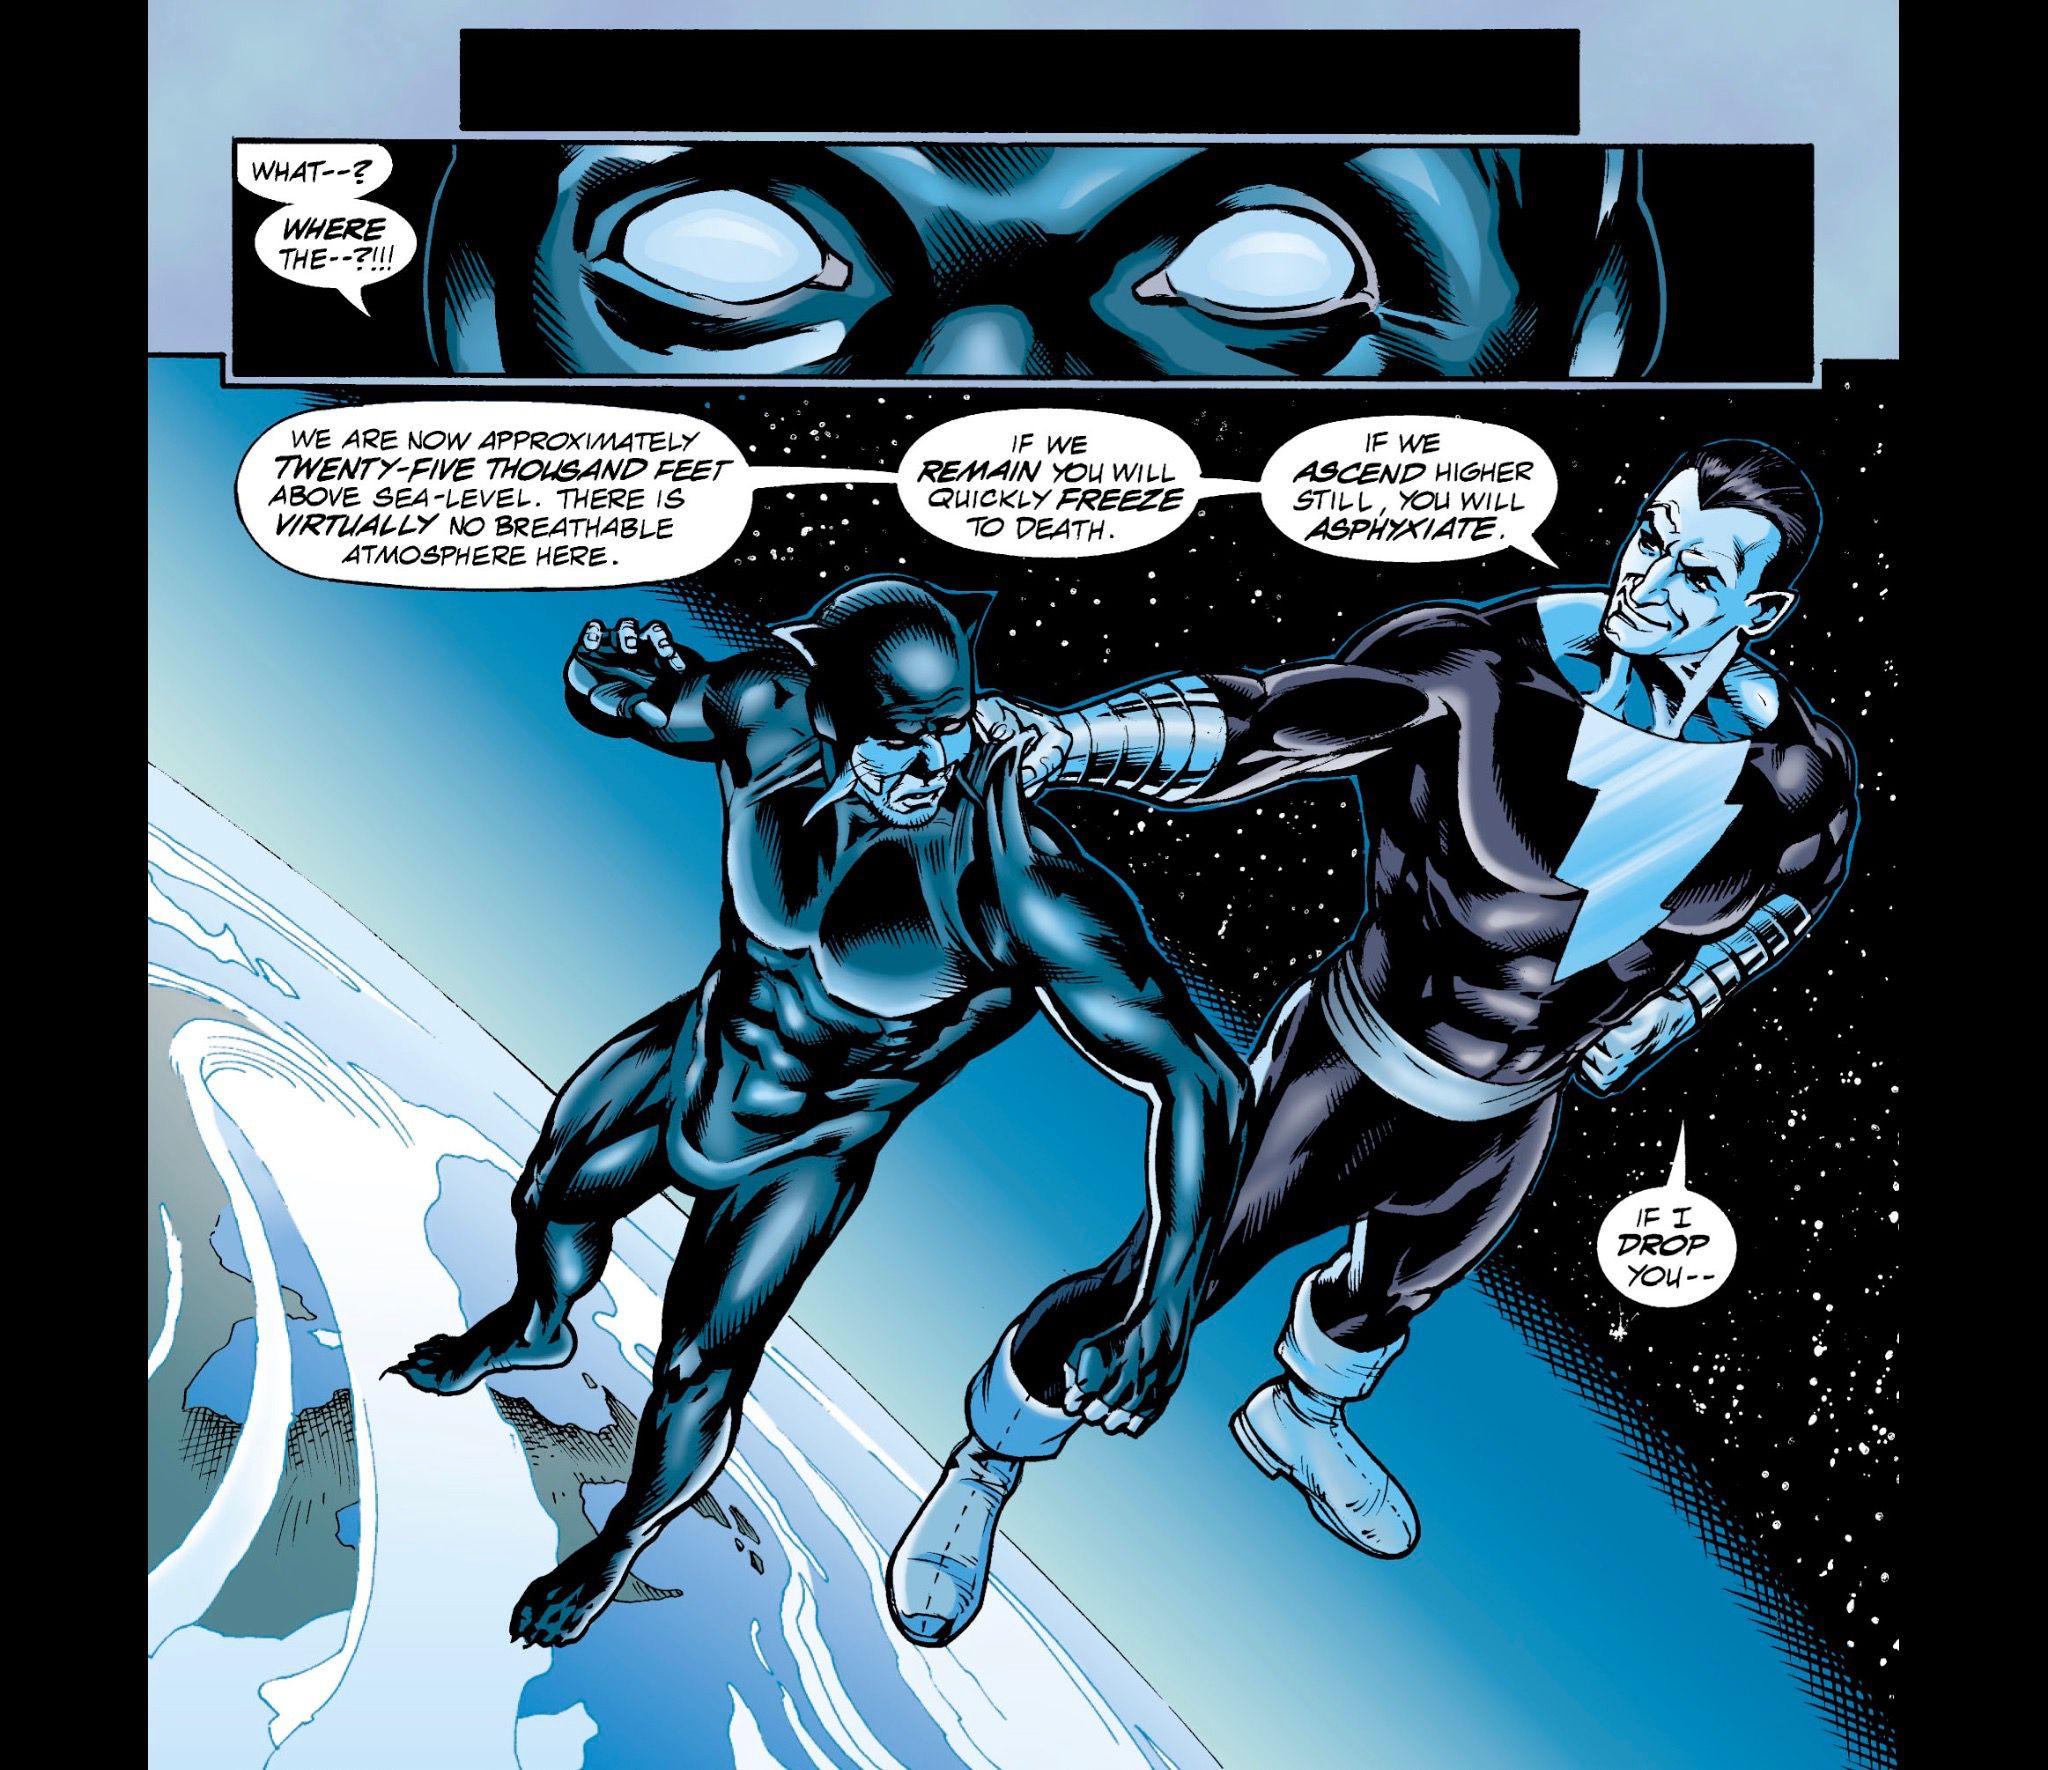 image from JSA 17, Black Adam vs Wildcat